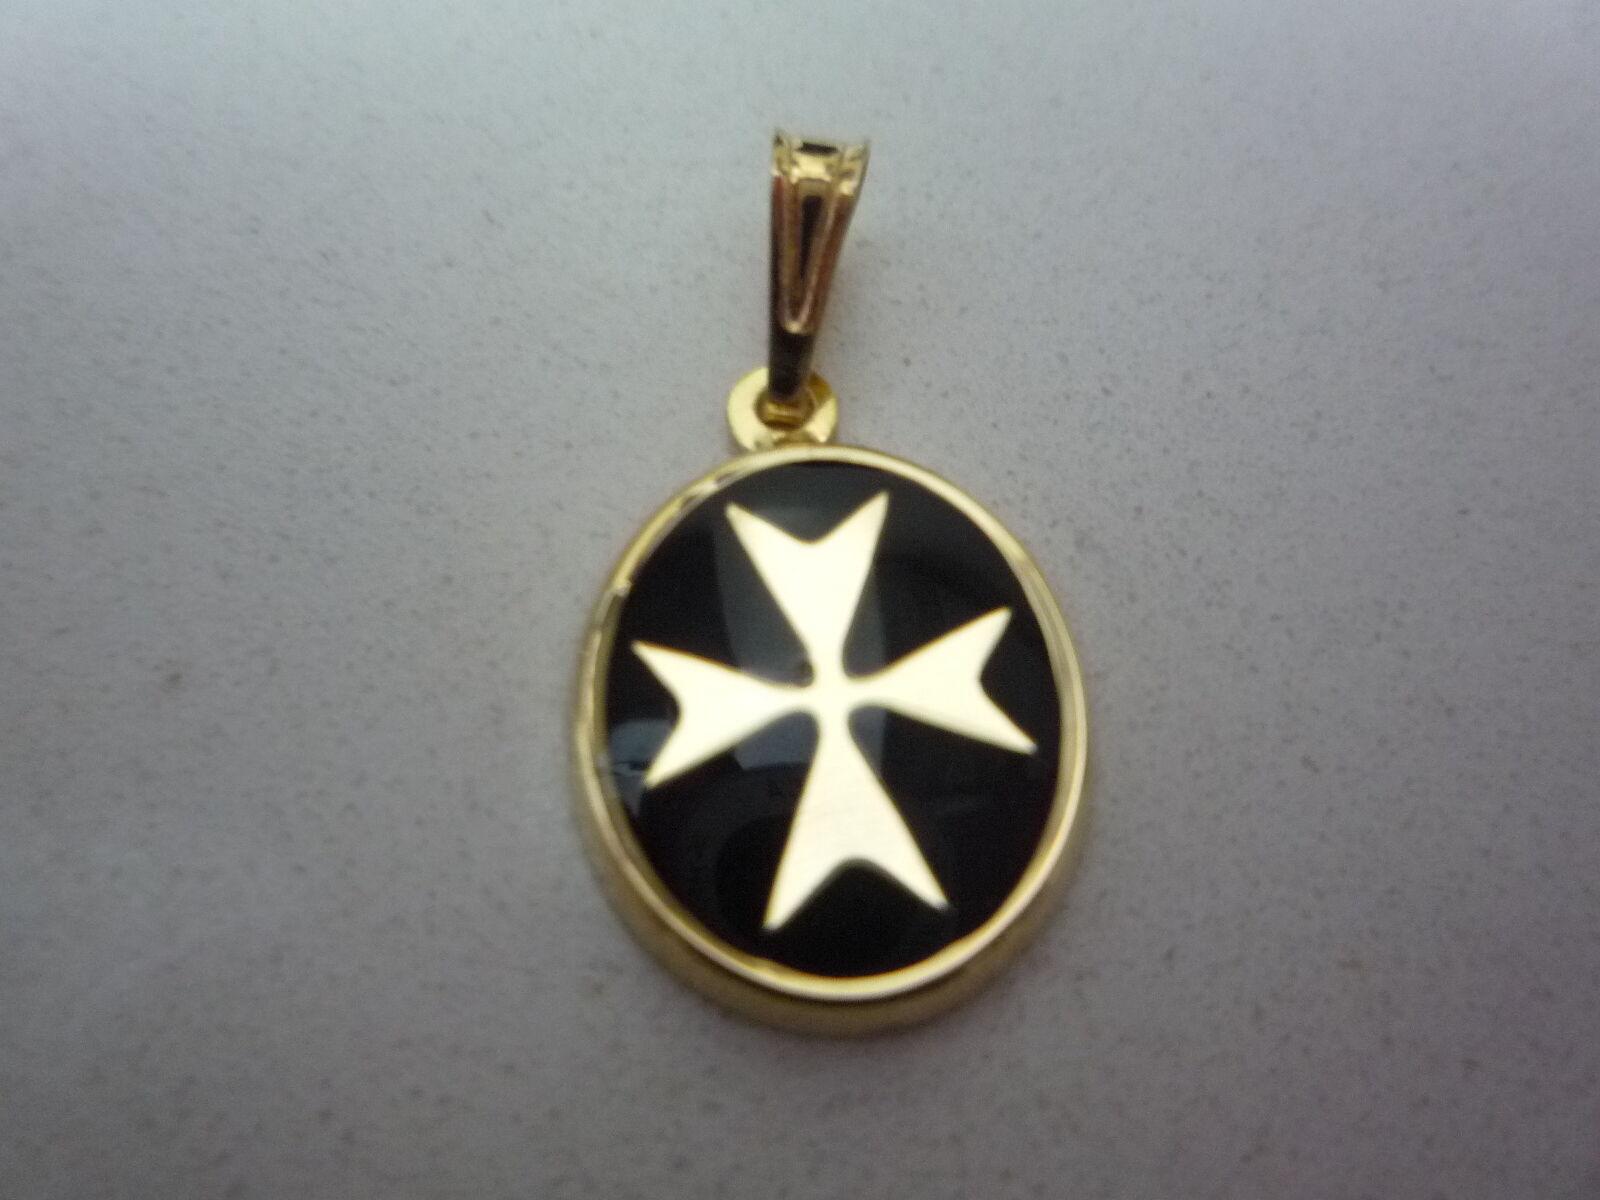 Neu 18 Karat Malteserkreuz Anhänger Oval black Emaille Smalt Ritter Malta